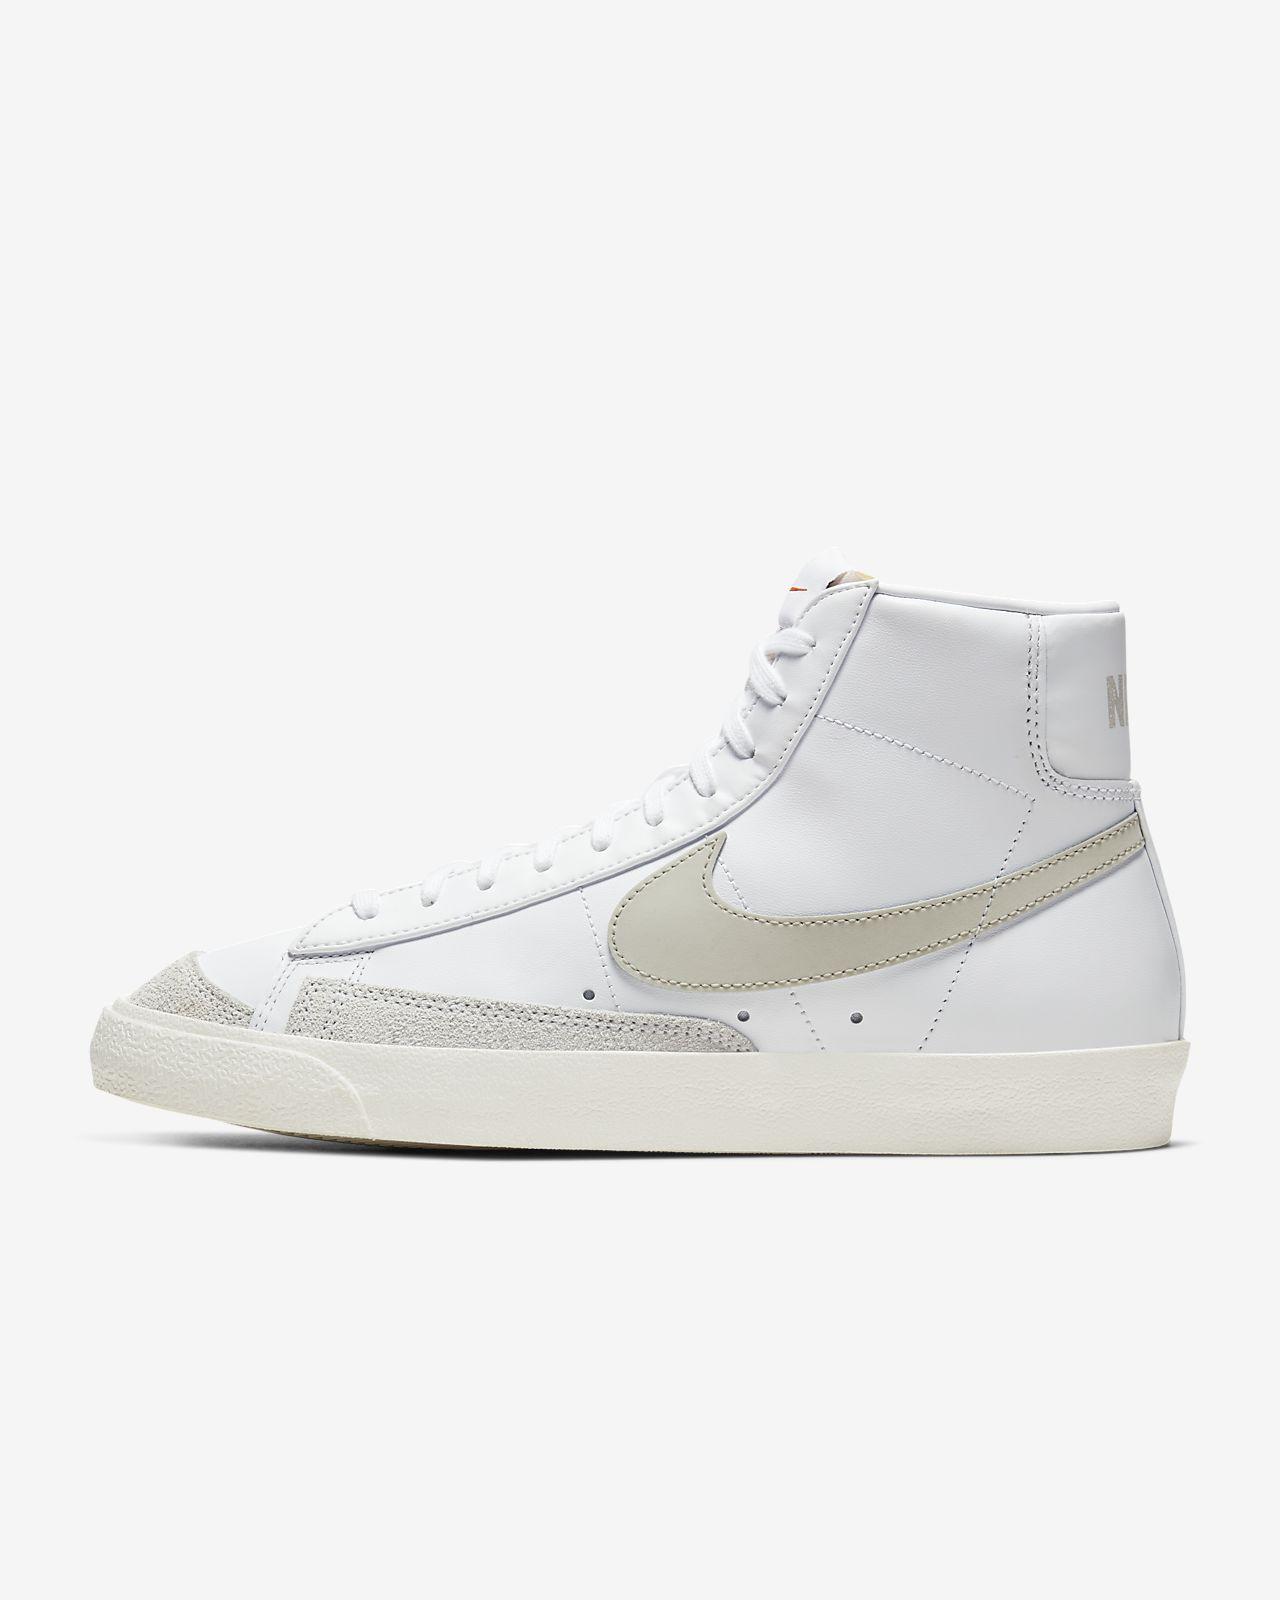 Chaussure Nike Blazer Mid '77 Vintage pour Homme